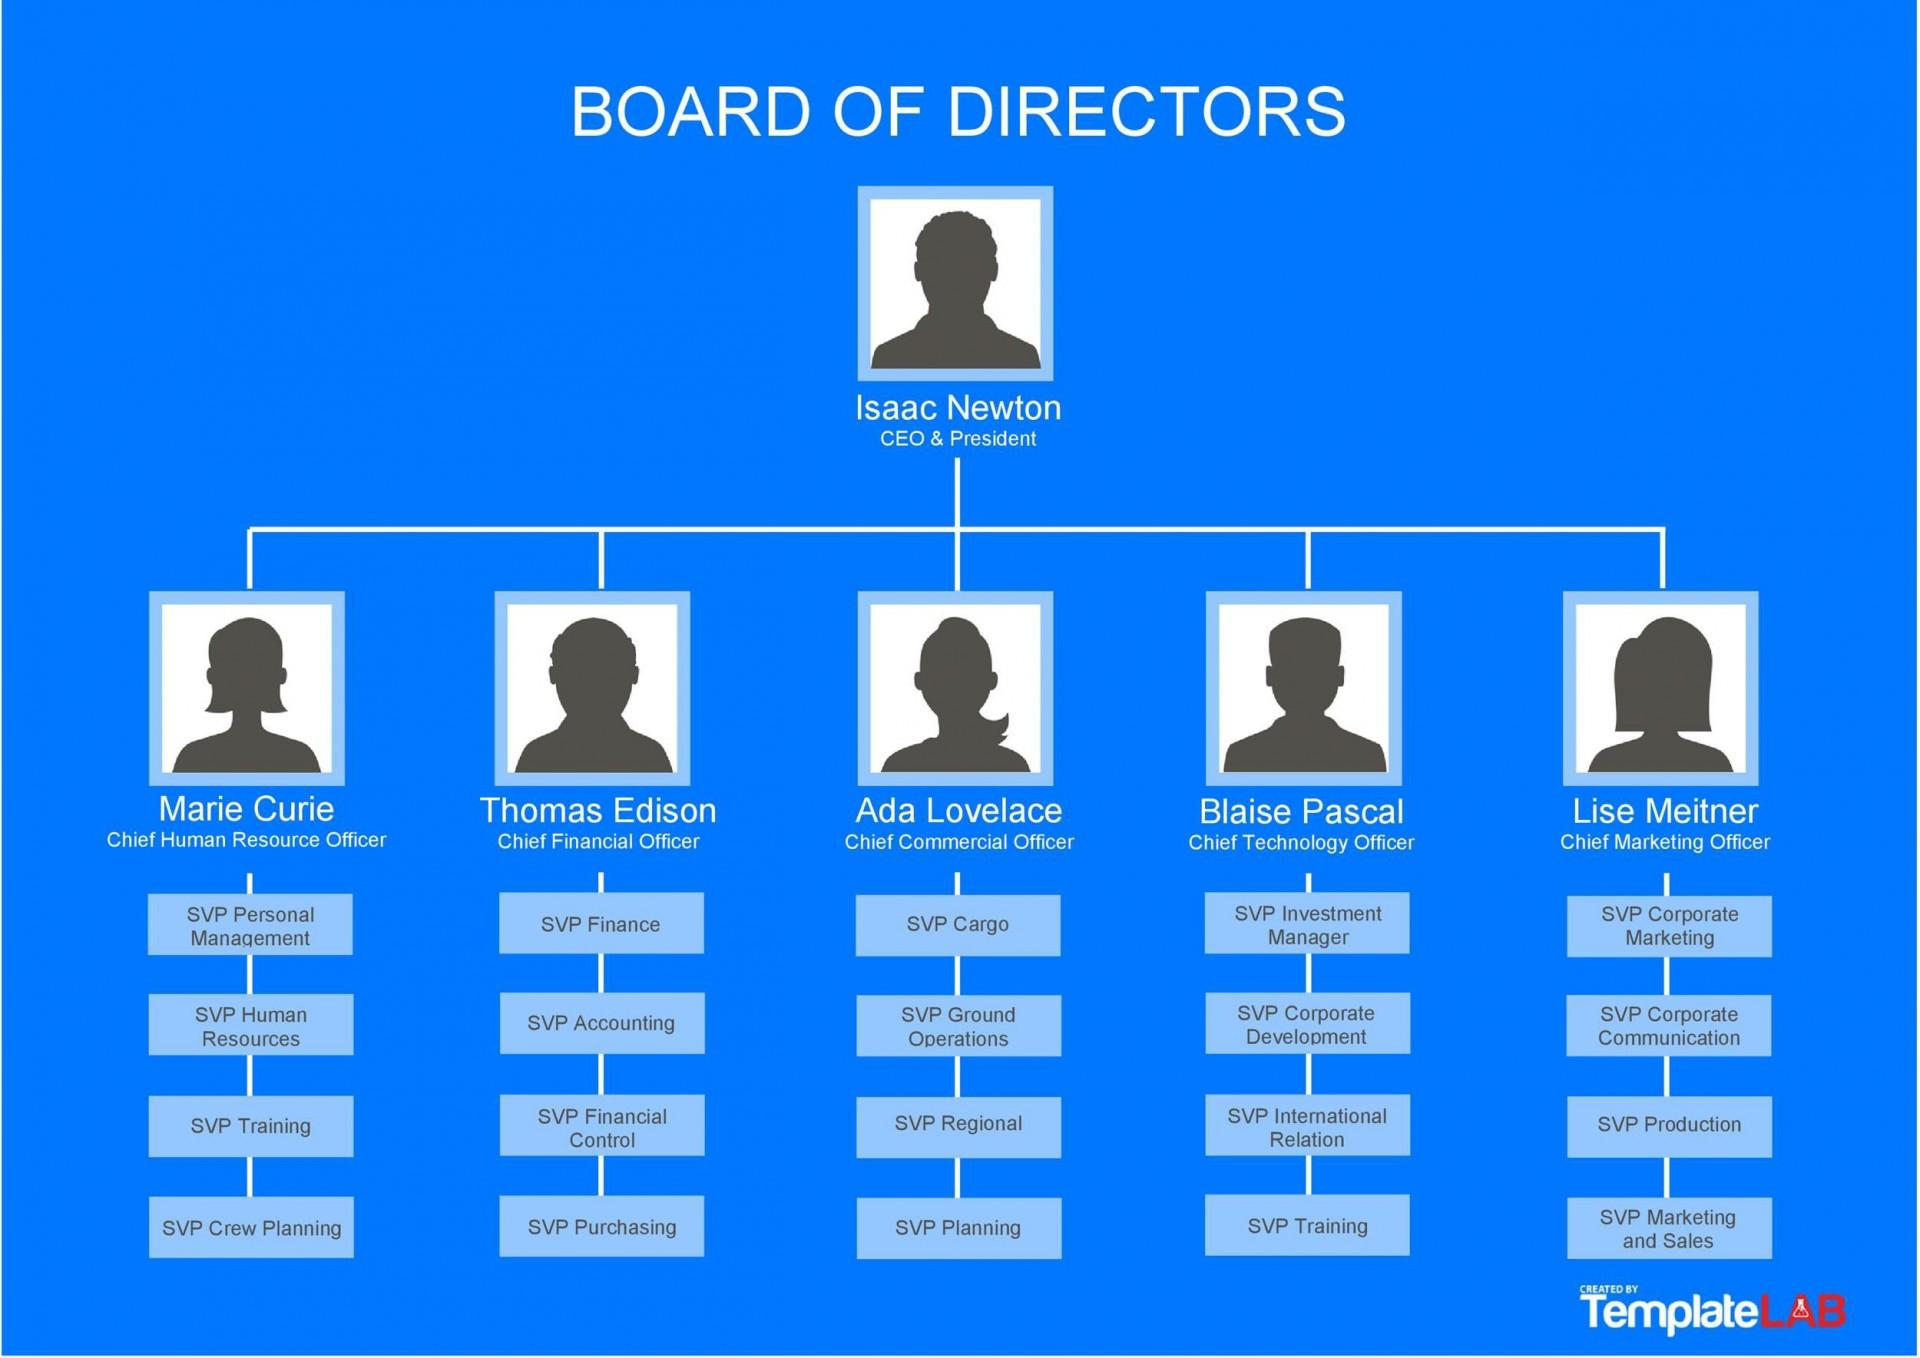 005 Breathtaking Microsoft Office Organizational Chart Template 2010 Example 1920